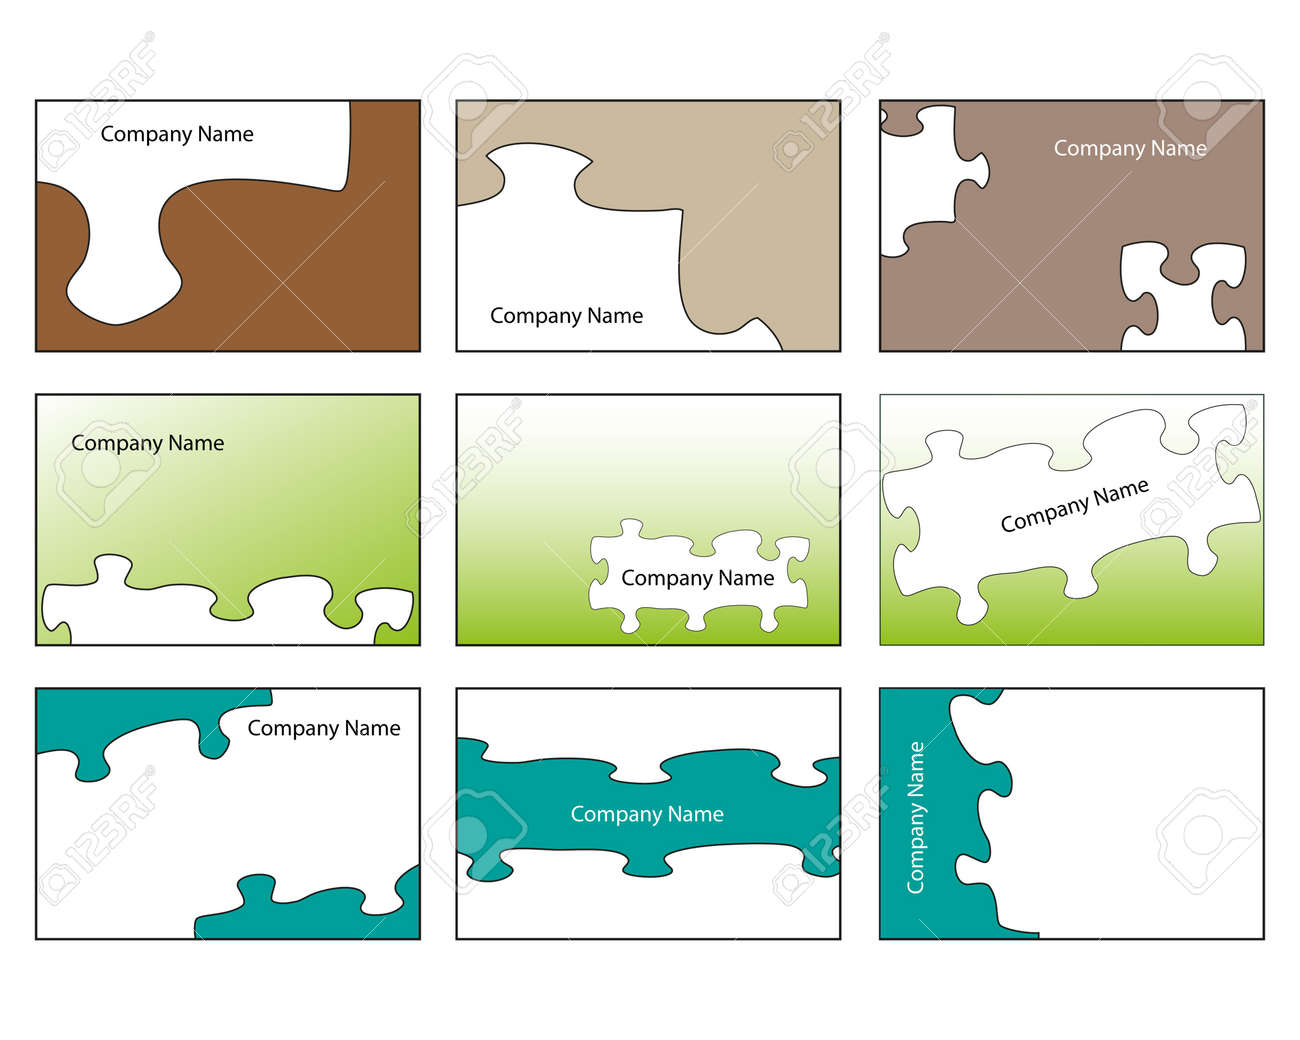 Nine Business Card Blanks Based On Jigsaw Designs Royalty Free ...